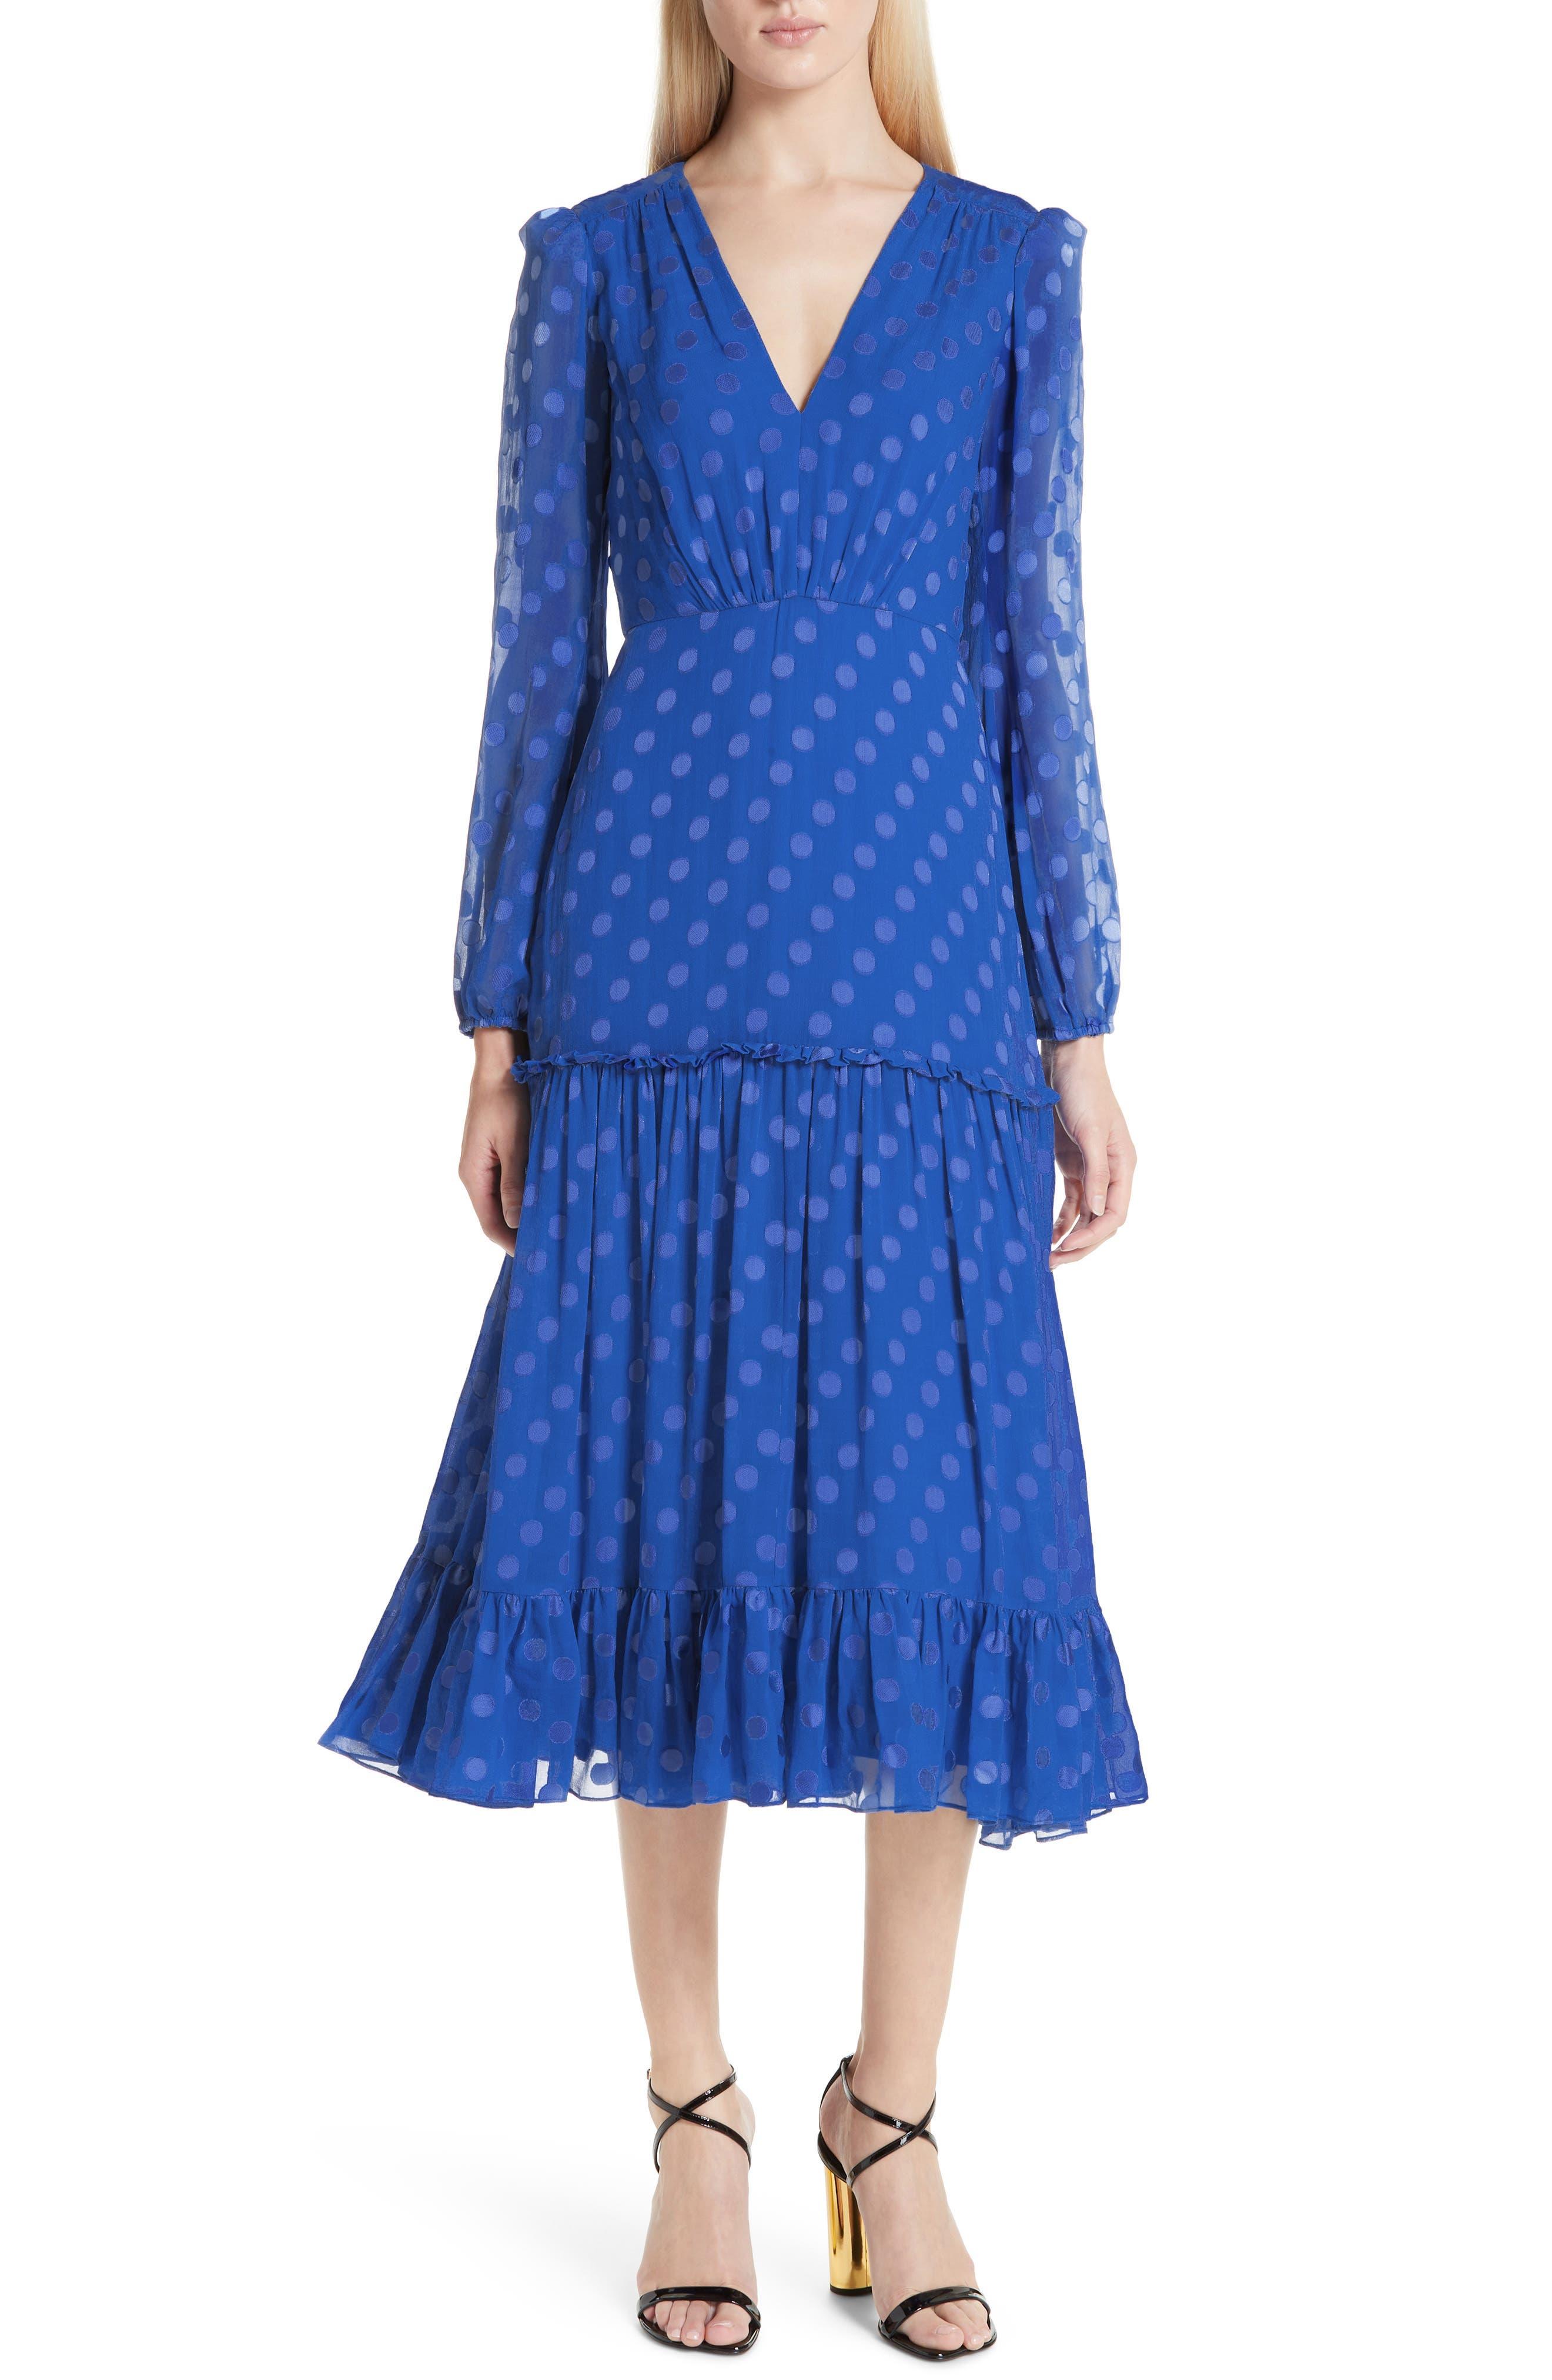 SALONI Polka Dot Ruffle Dress, Main, color, COBALT BLUE